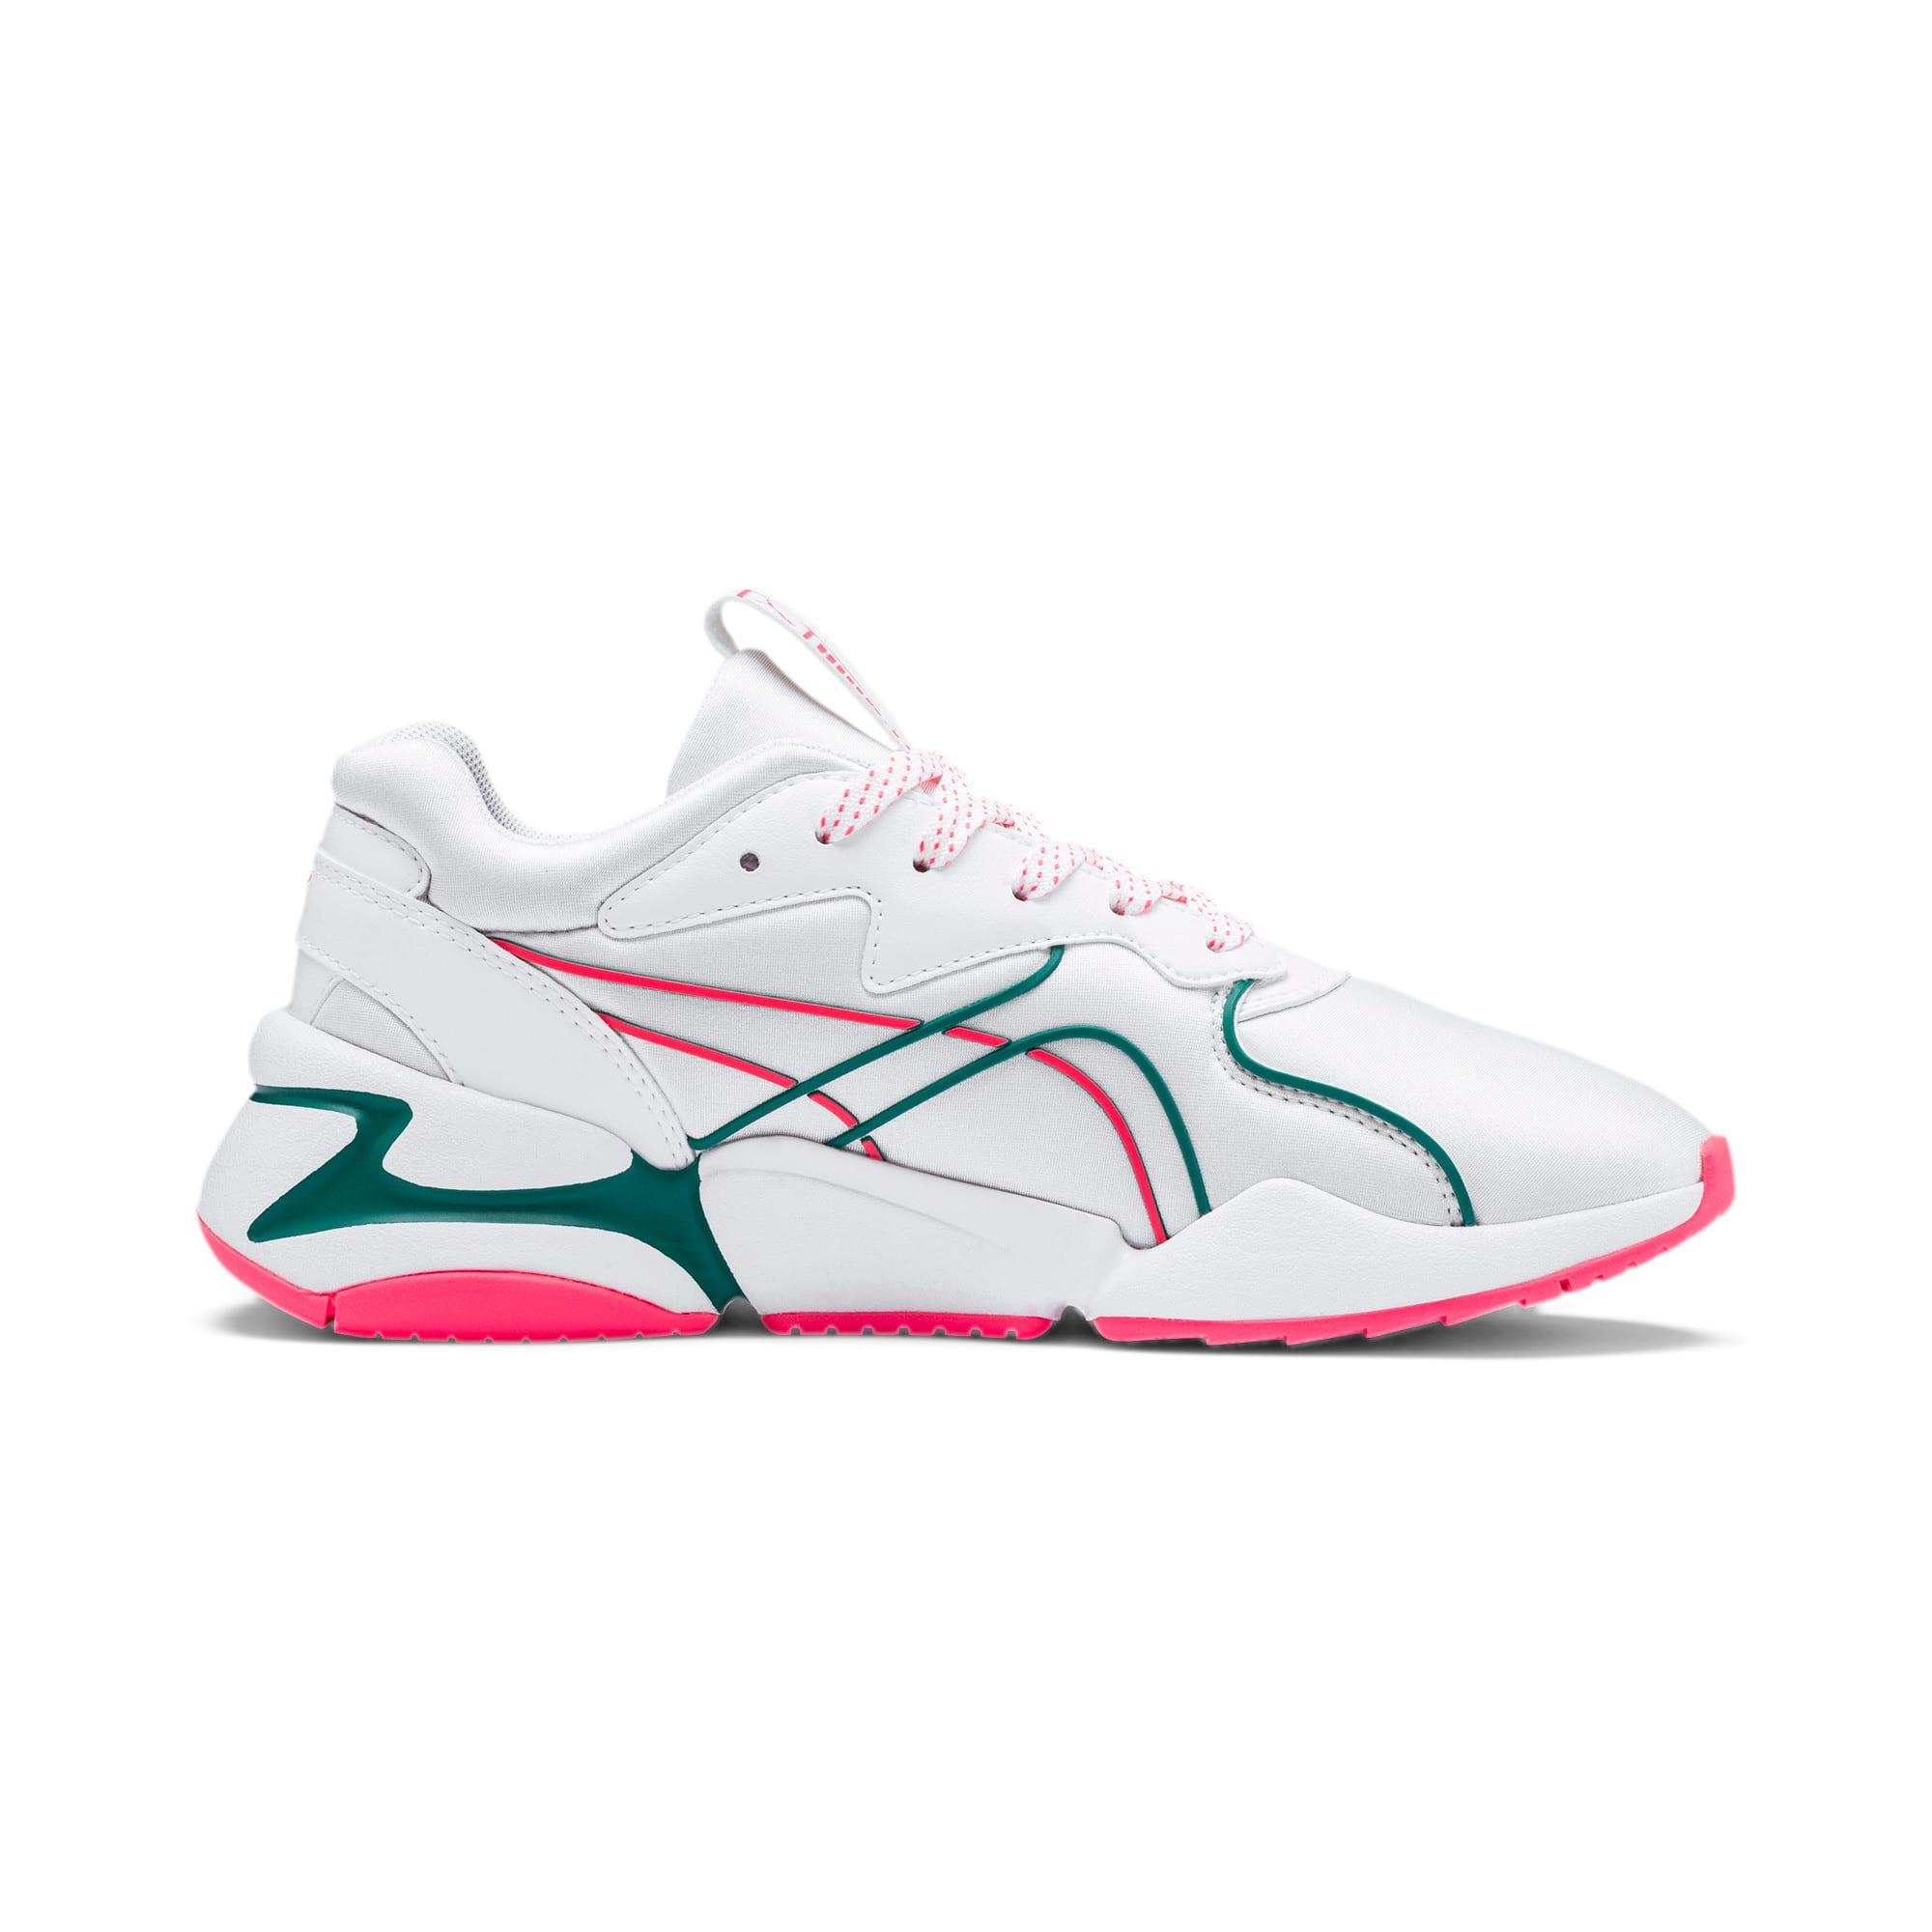 Thumbnail 6 of Nova Hypertech Women's Sneakers, Puma White, medium